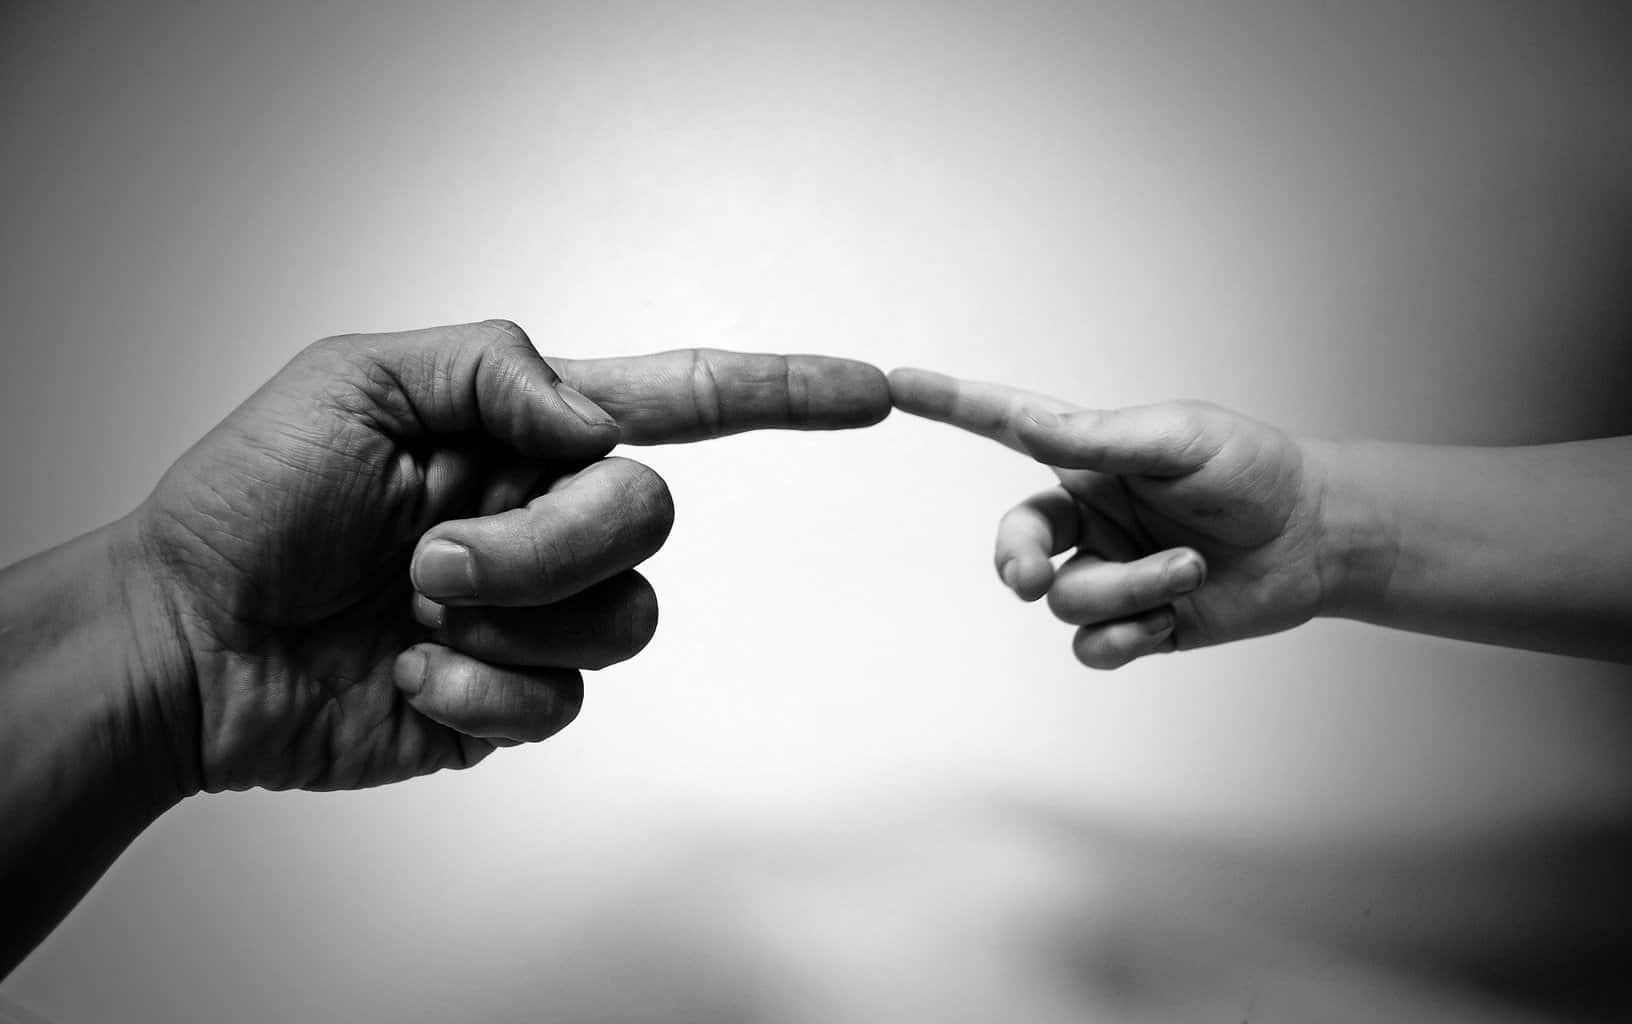 align fingers, index fingers, hands